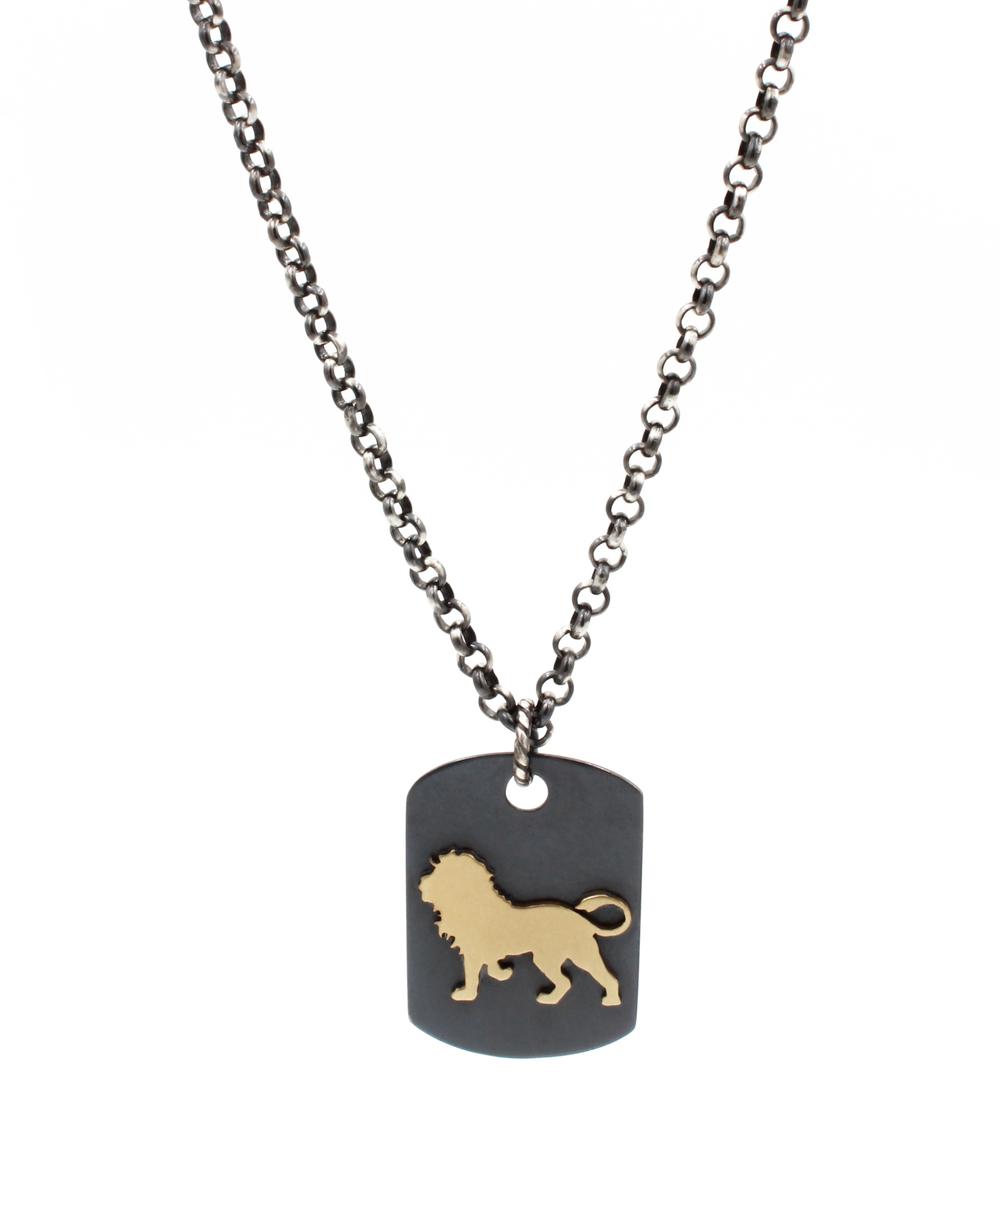 Lion Dog Tag Necklace.jpg